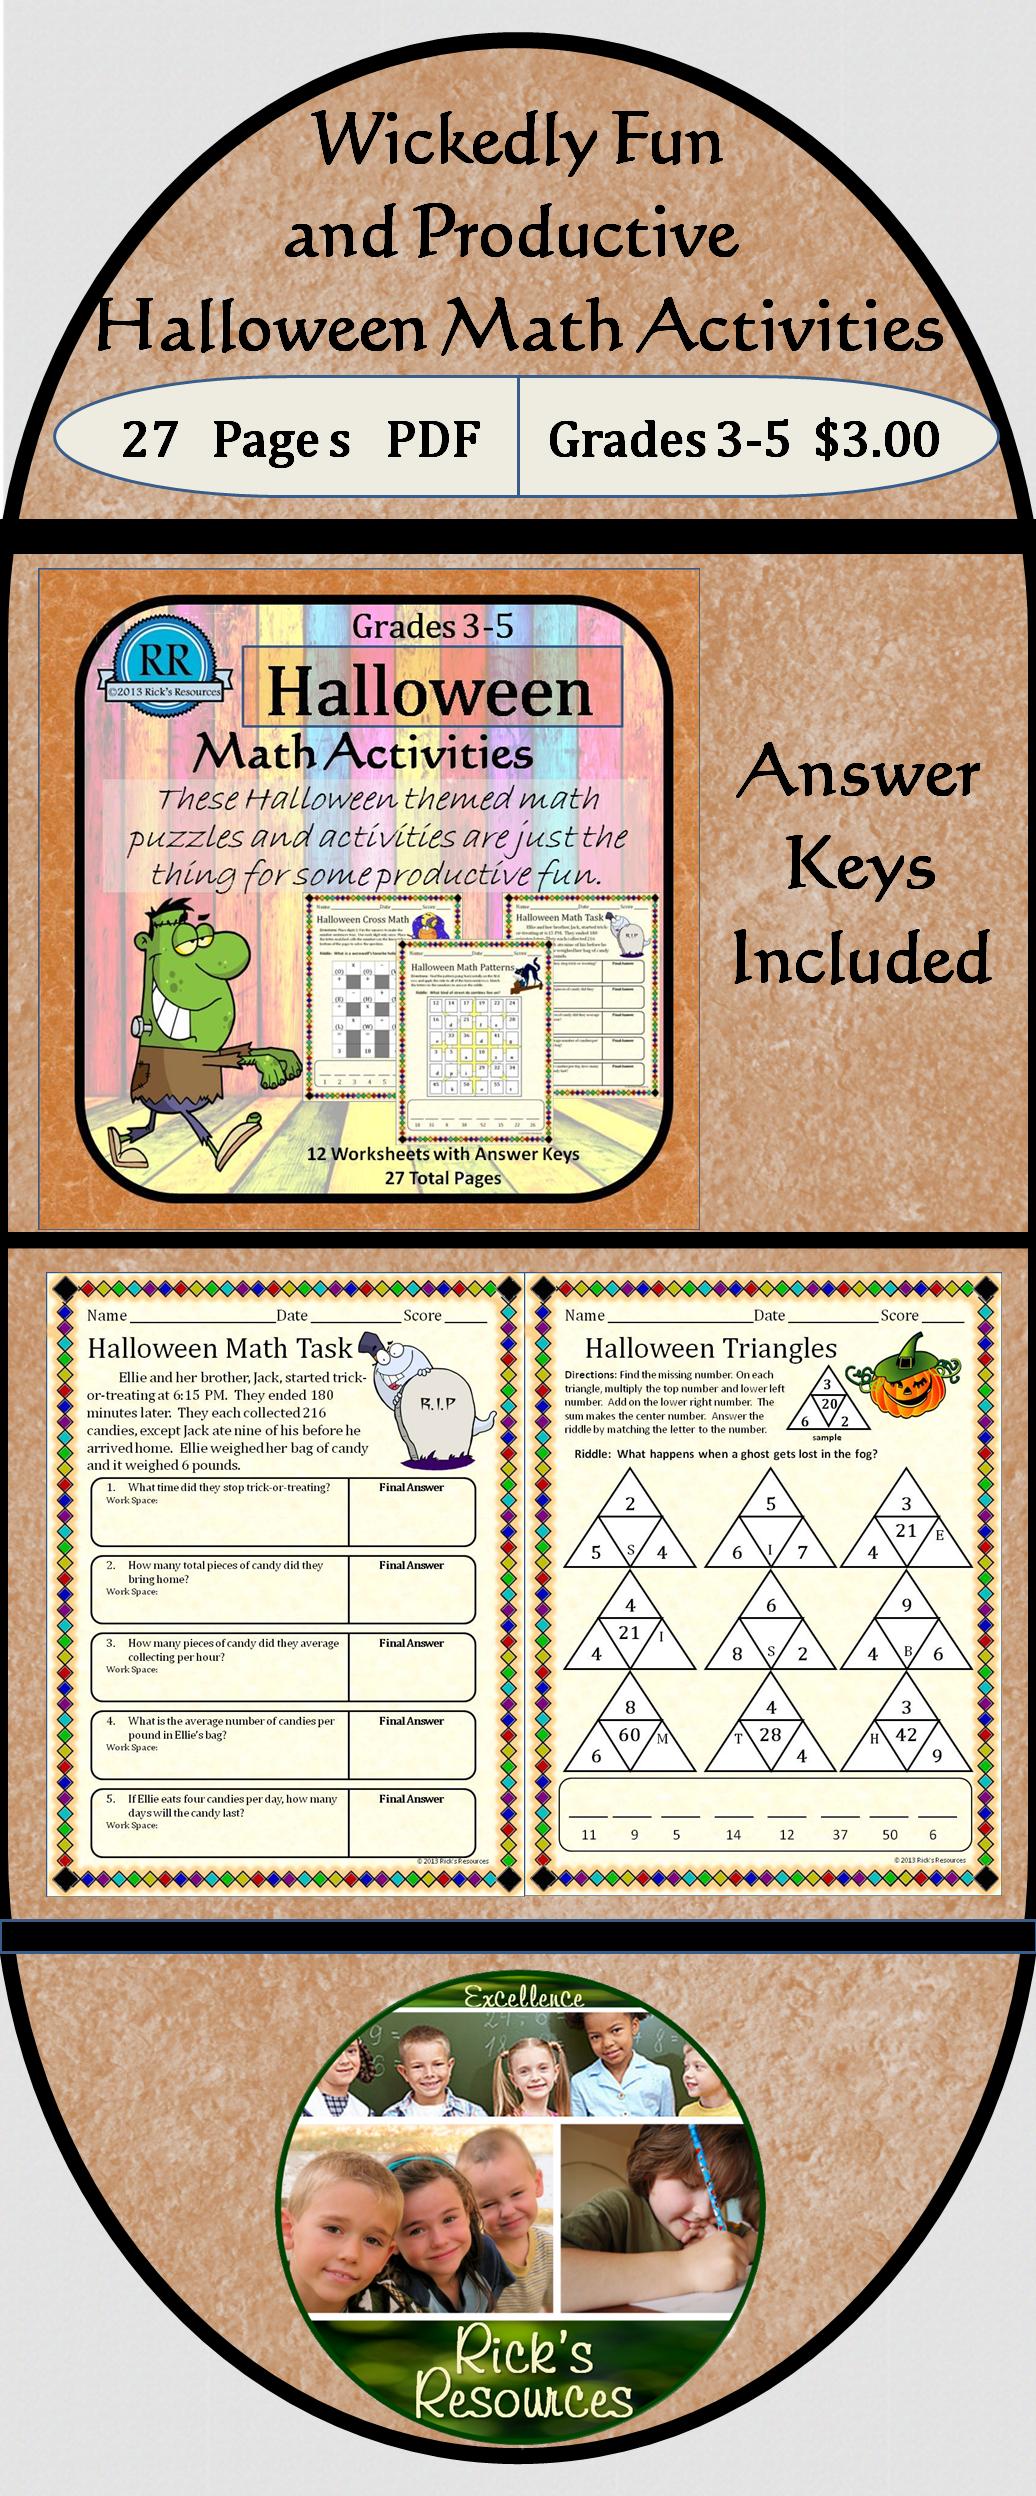 Halloween Math Activities Math activities, Halloween